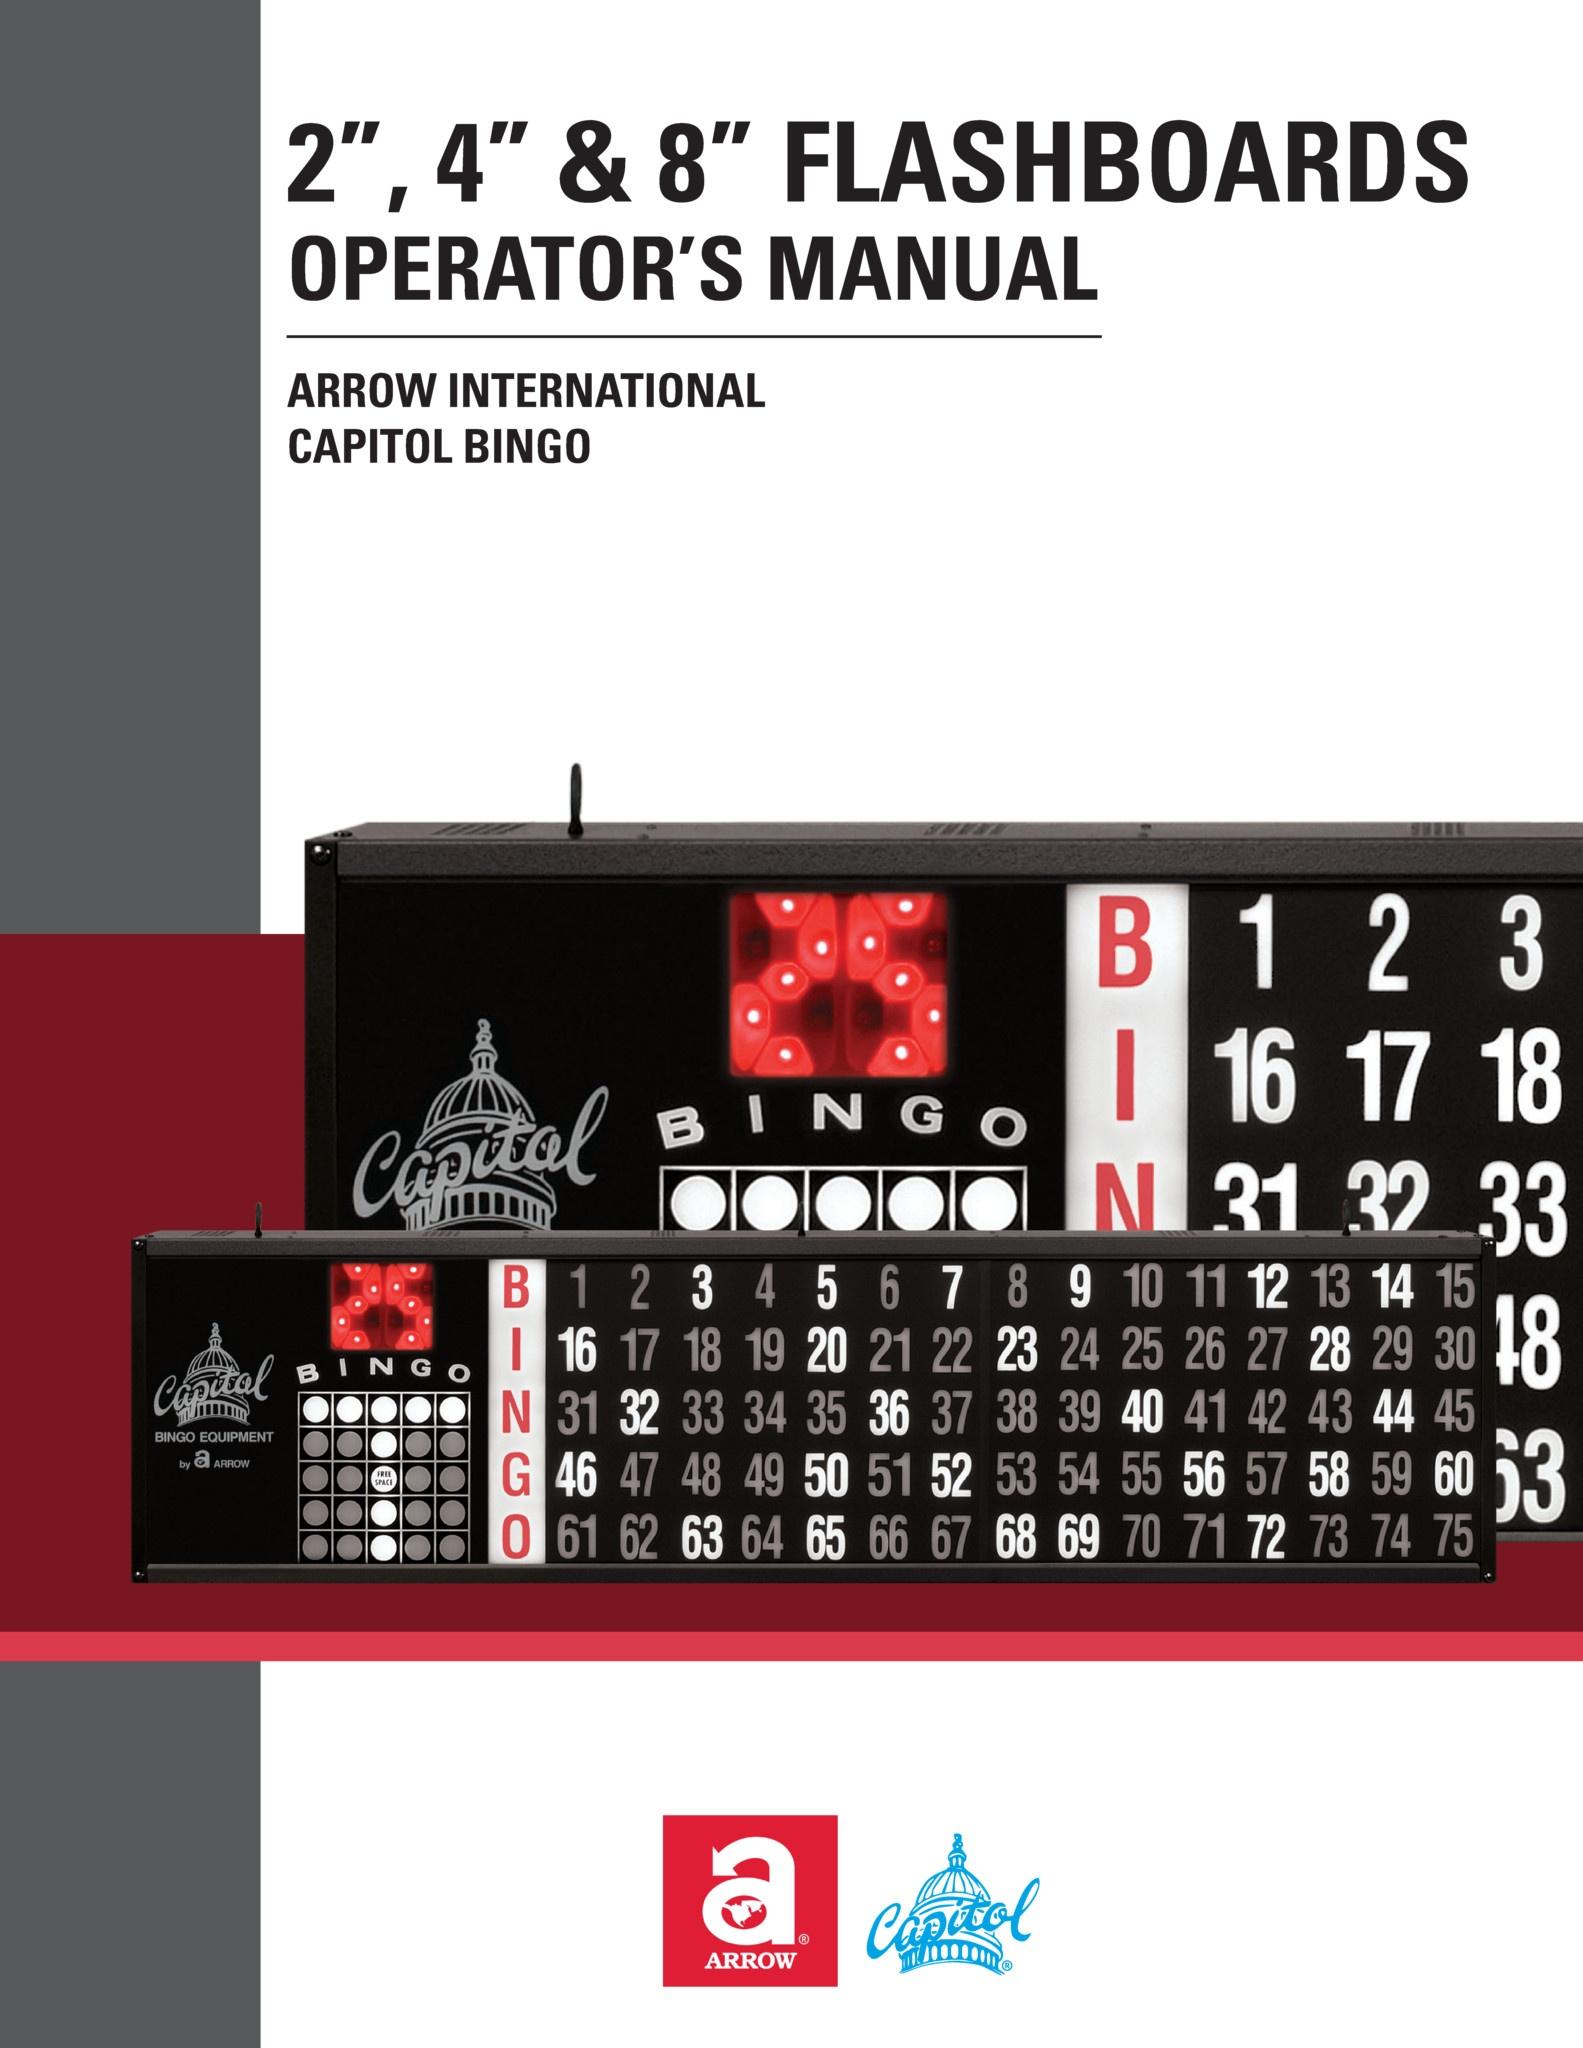 Flashboard Manual Equipment Manuals